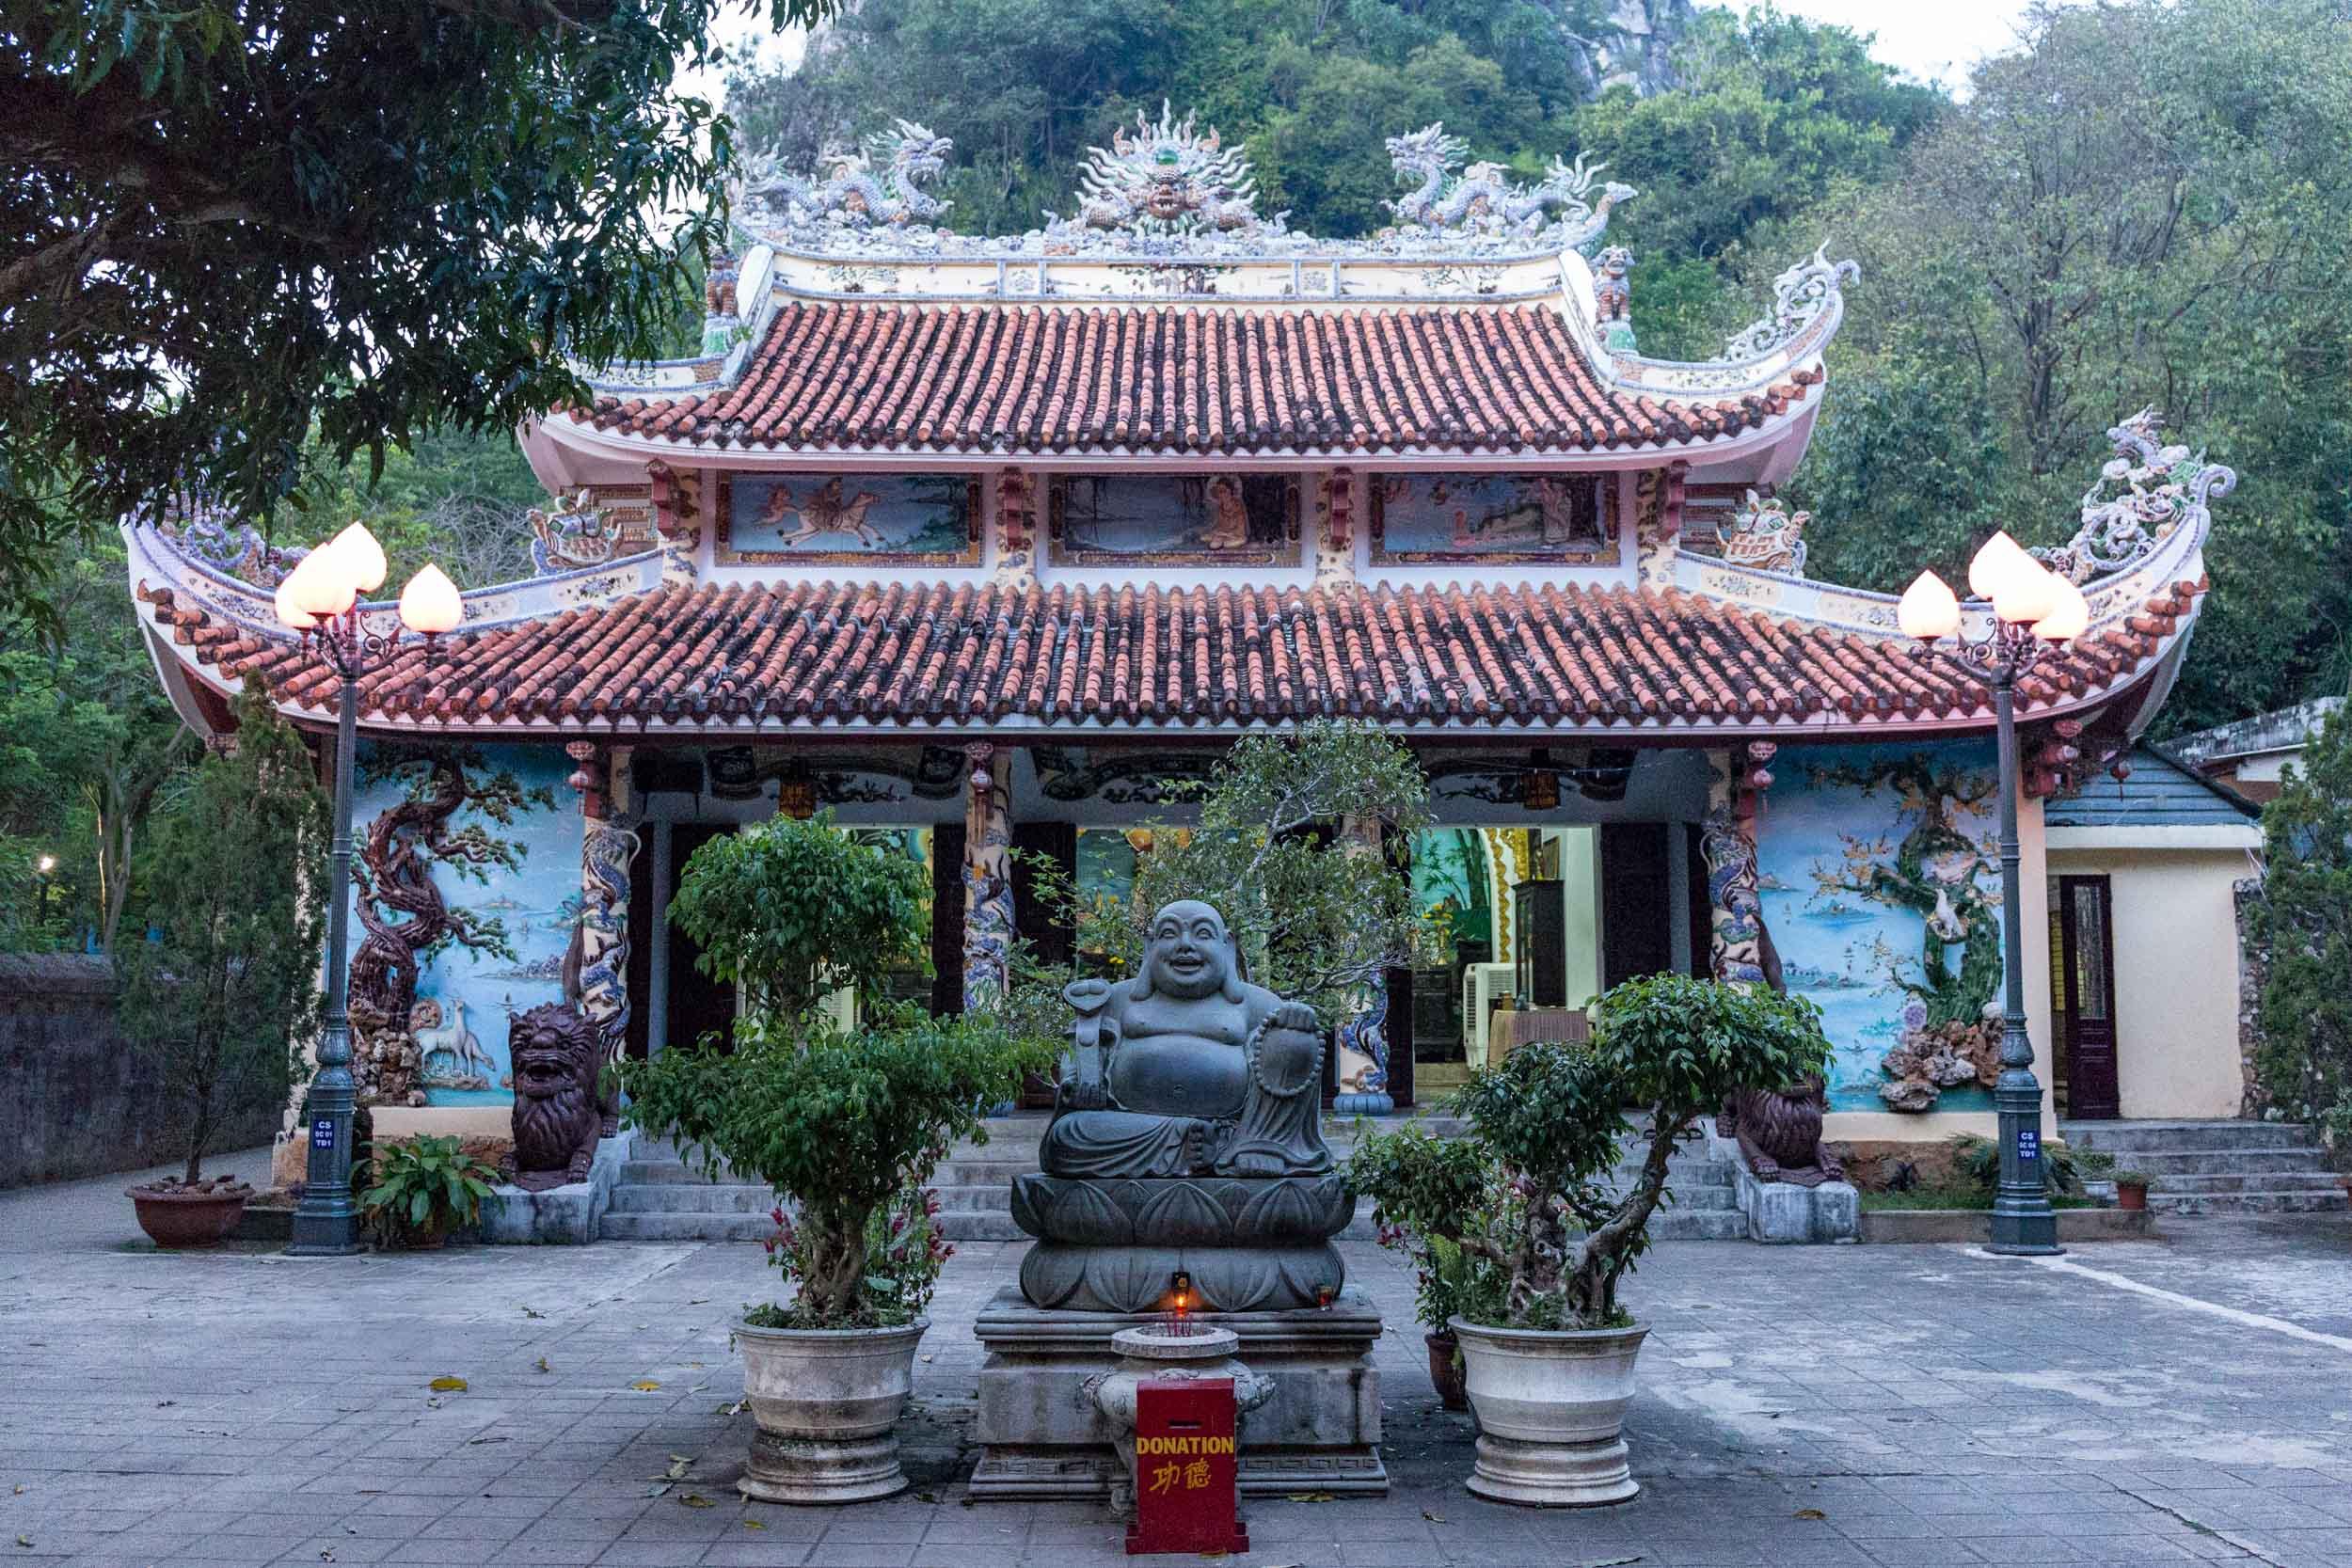 Temple Marble Mountain. Da Nang, Vietnam.